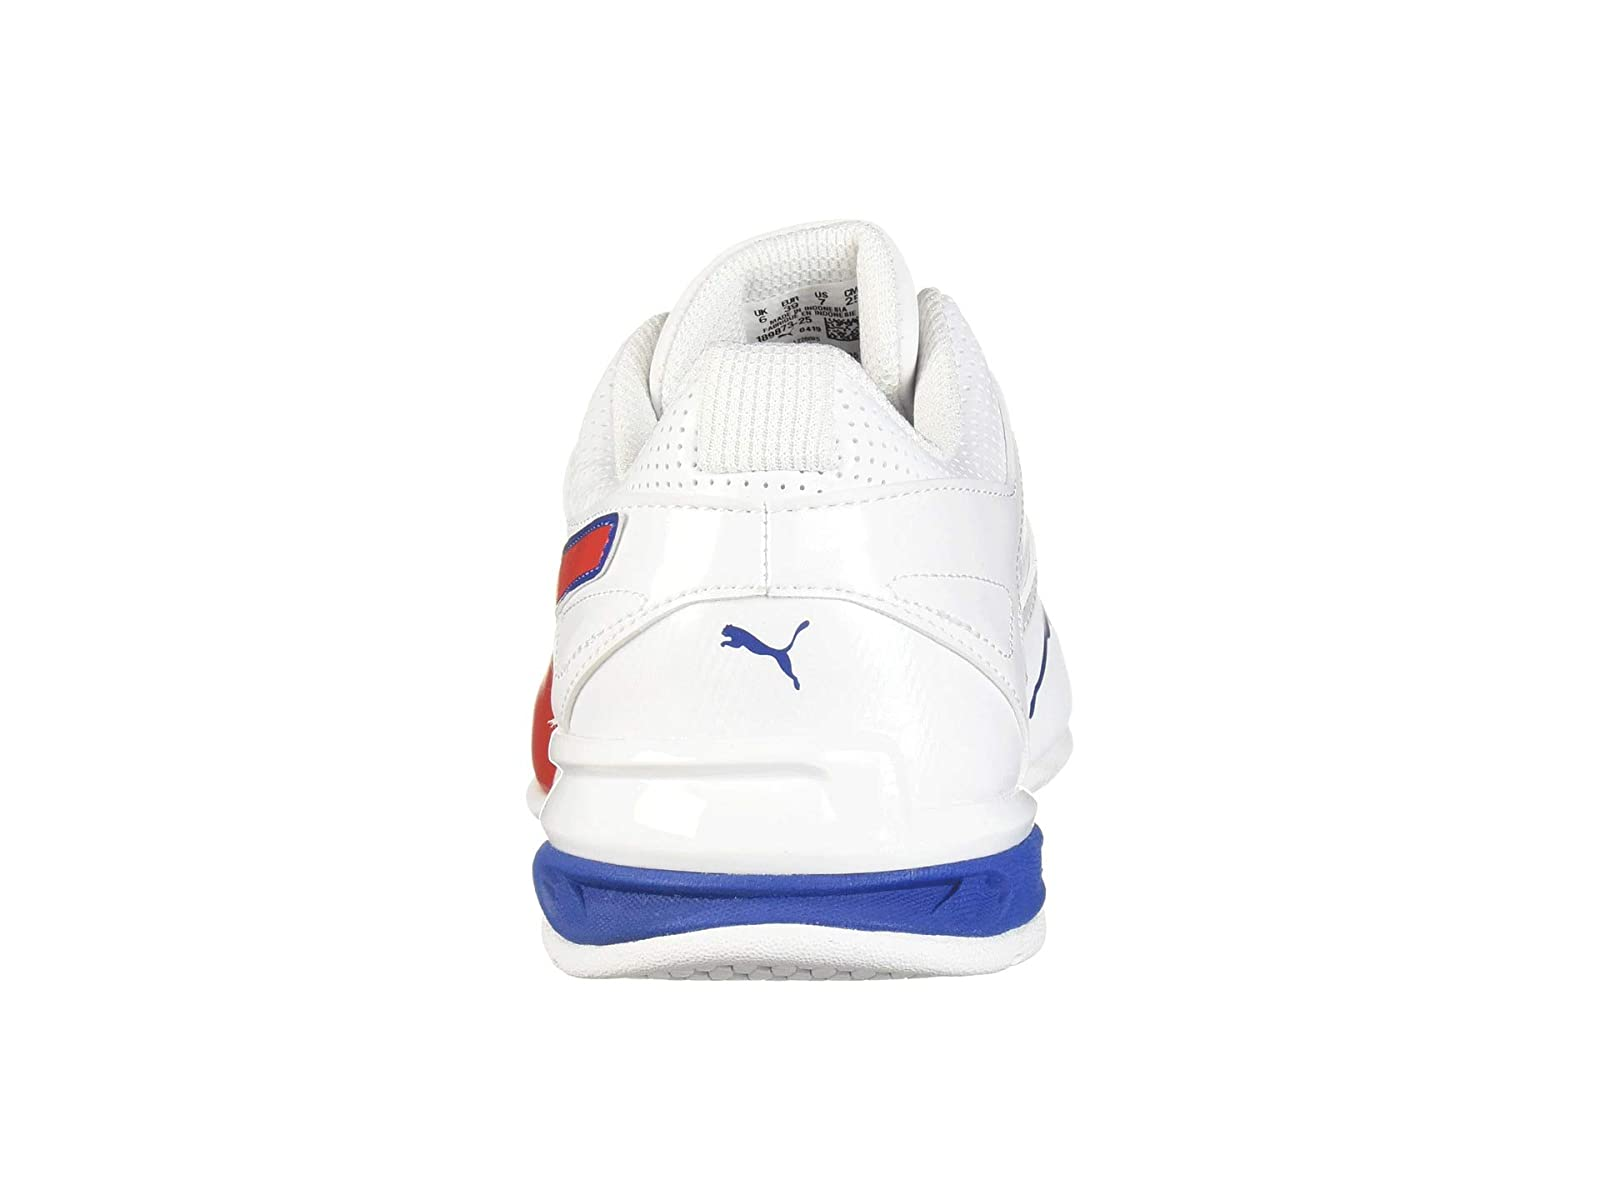 Men-039-s-Scarpe-Da-Ginnastica-amp-Athletic-Shoes-Puma-Tazon-6-FM miniatura 13